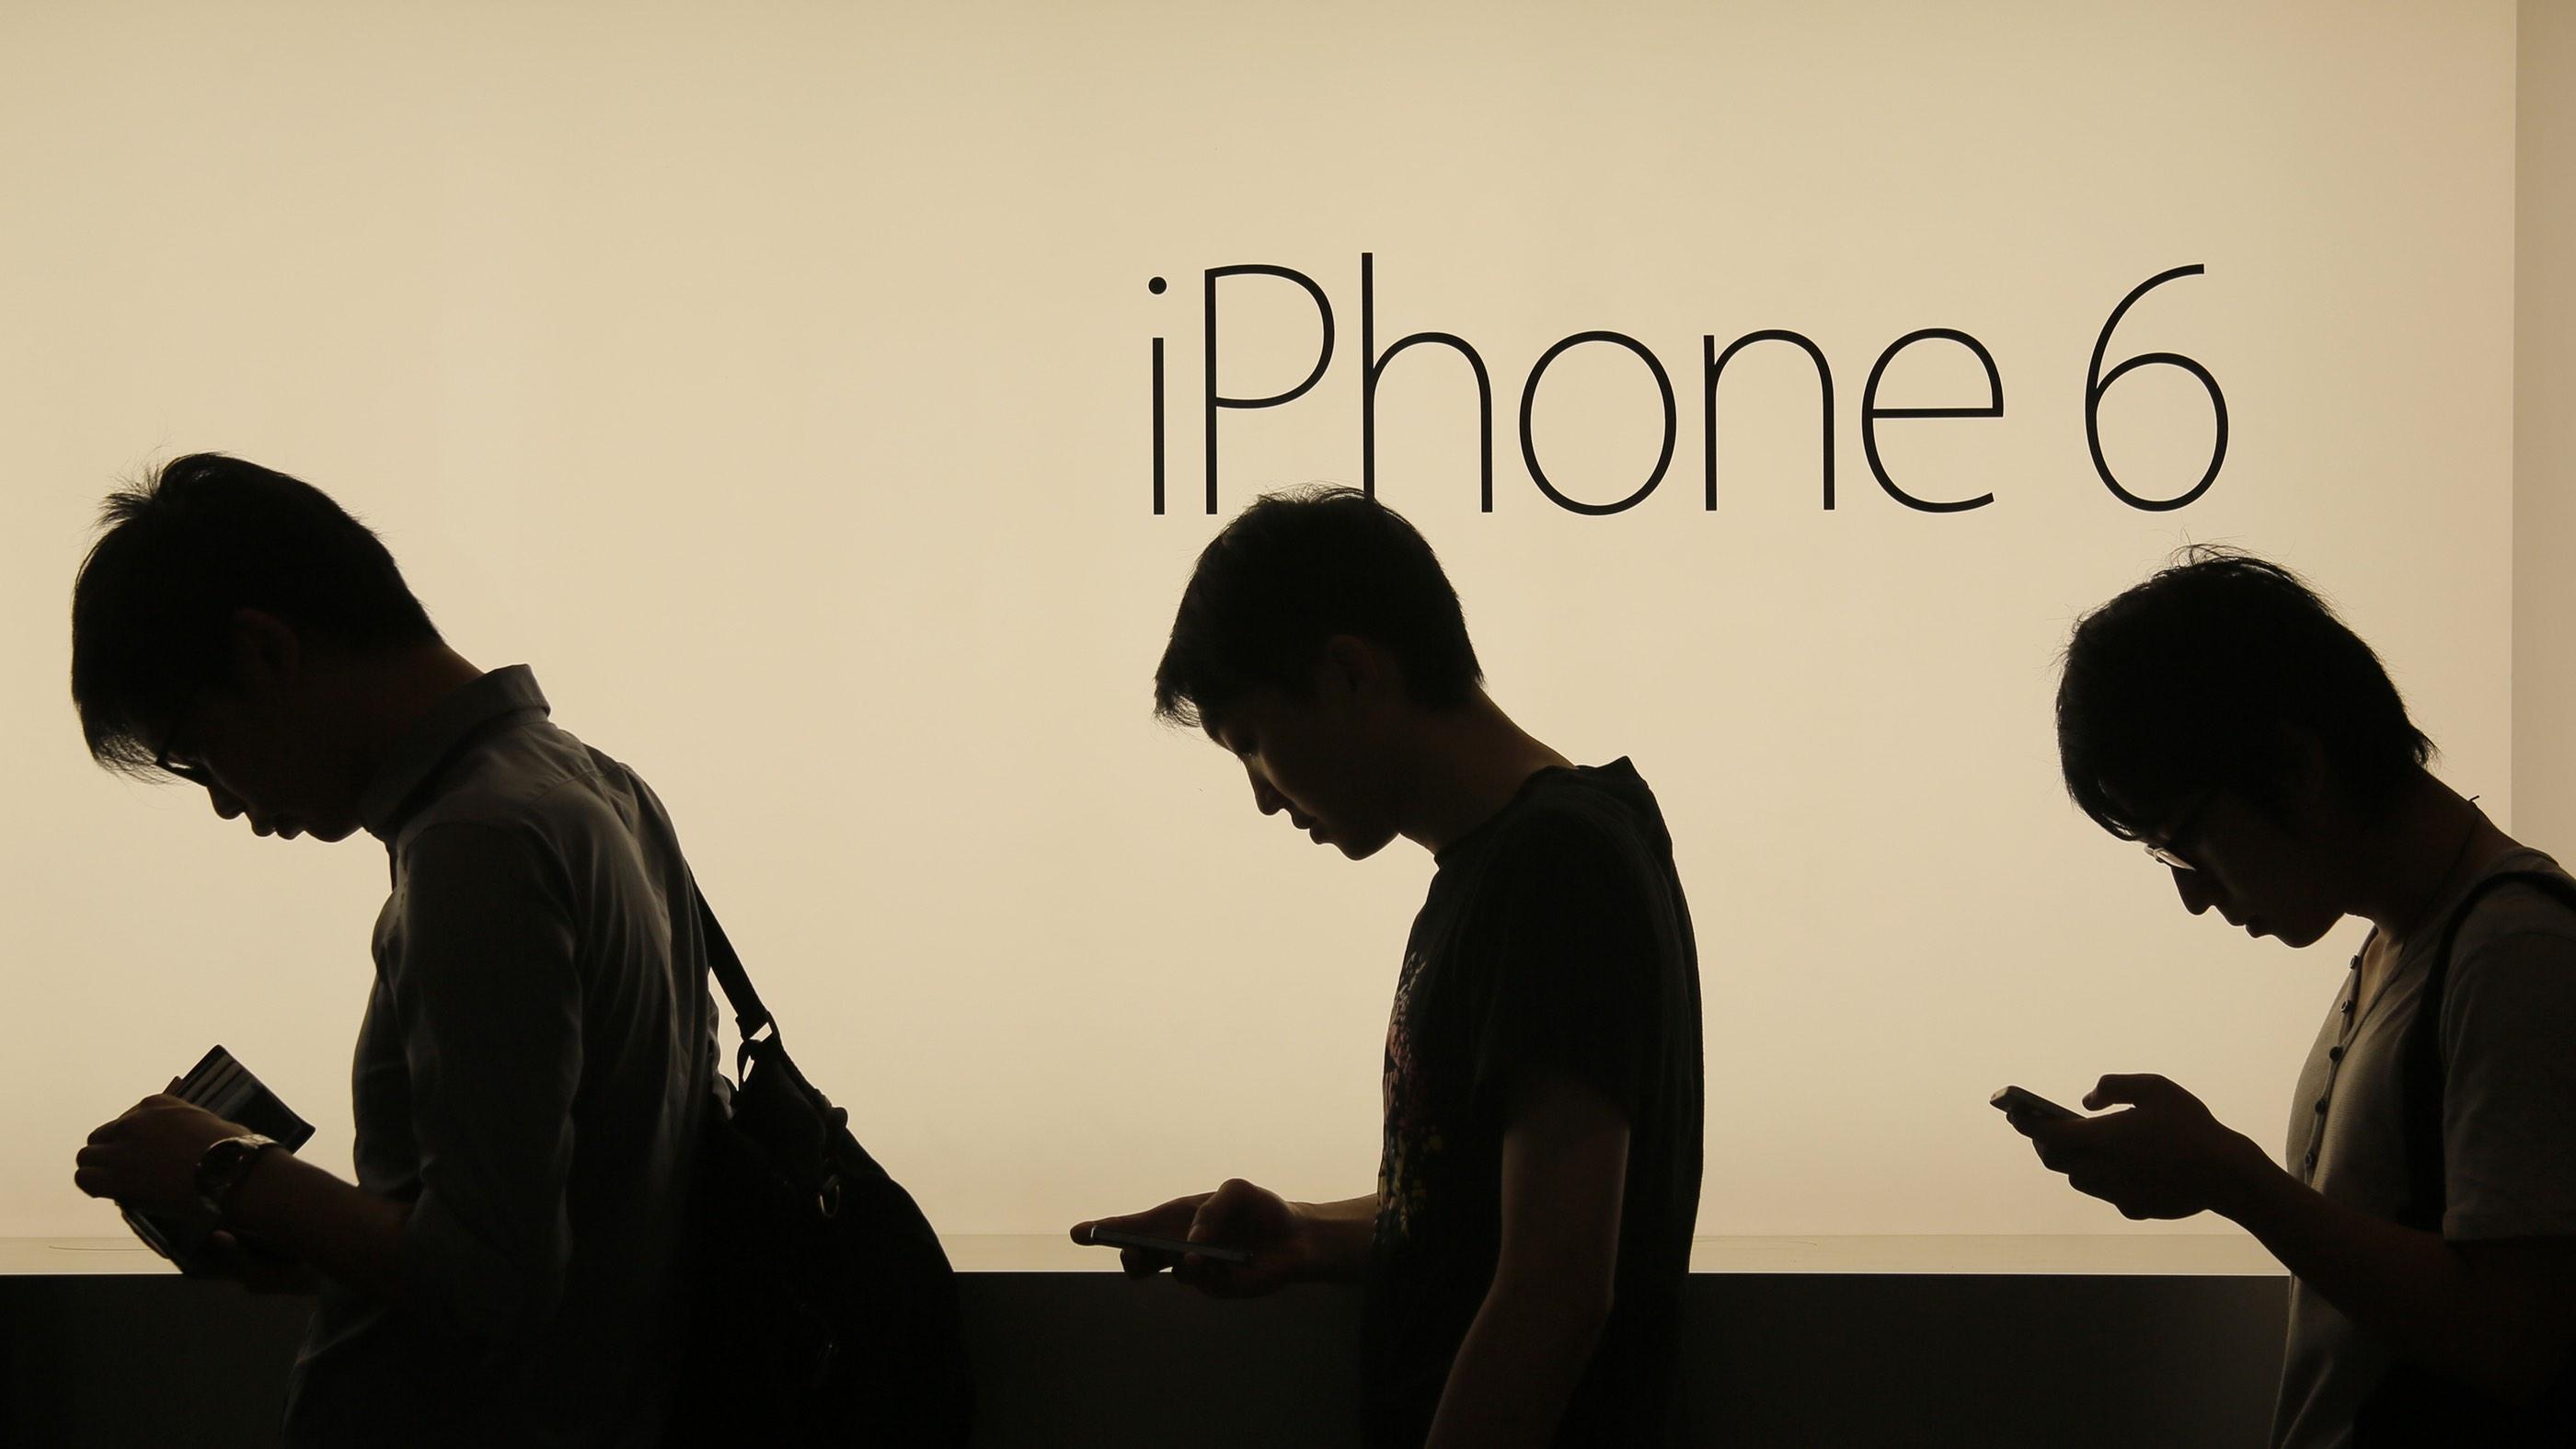 iPhone 6 reading